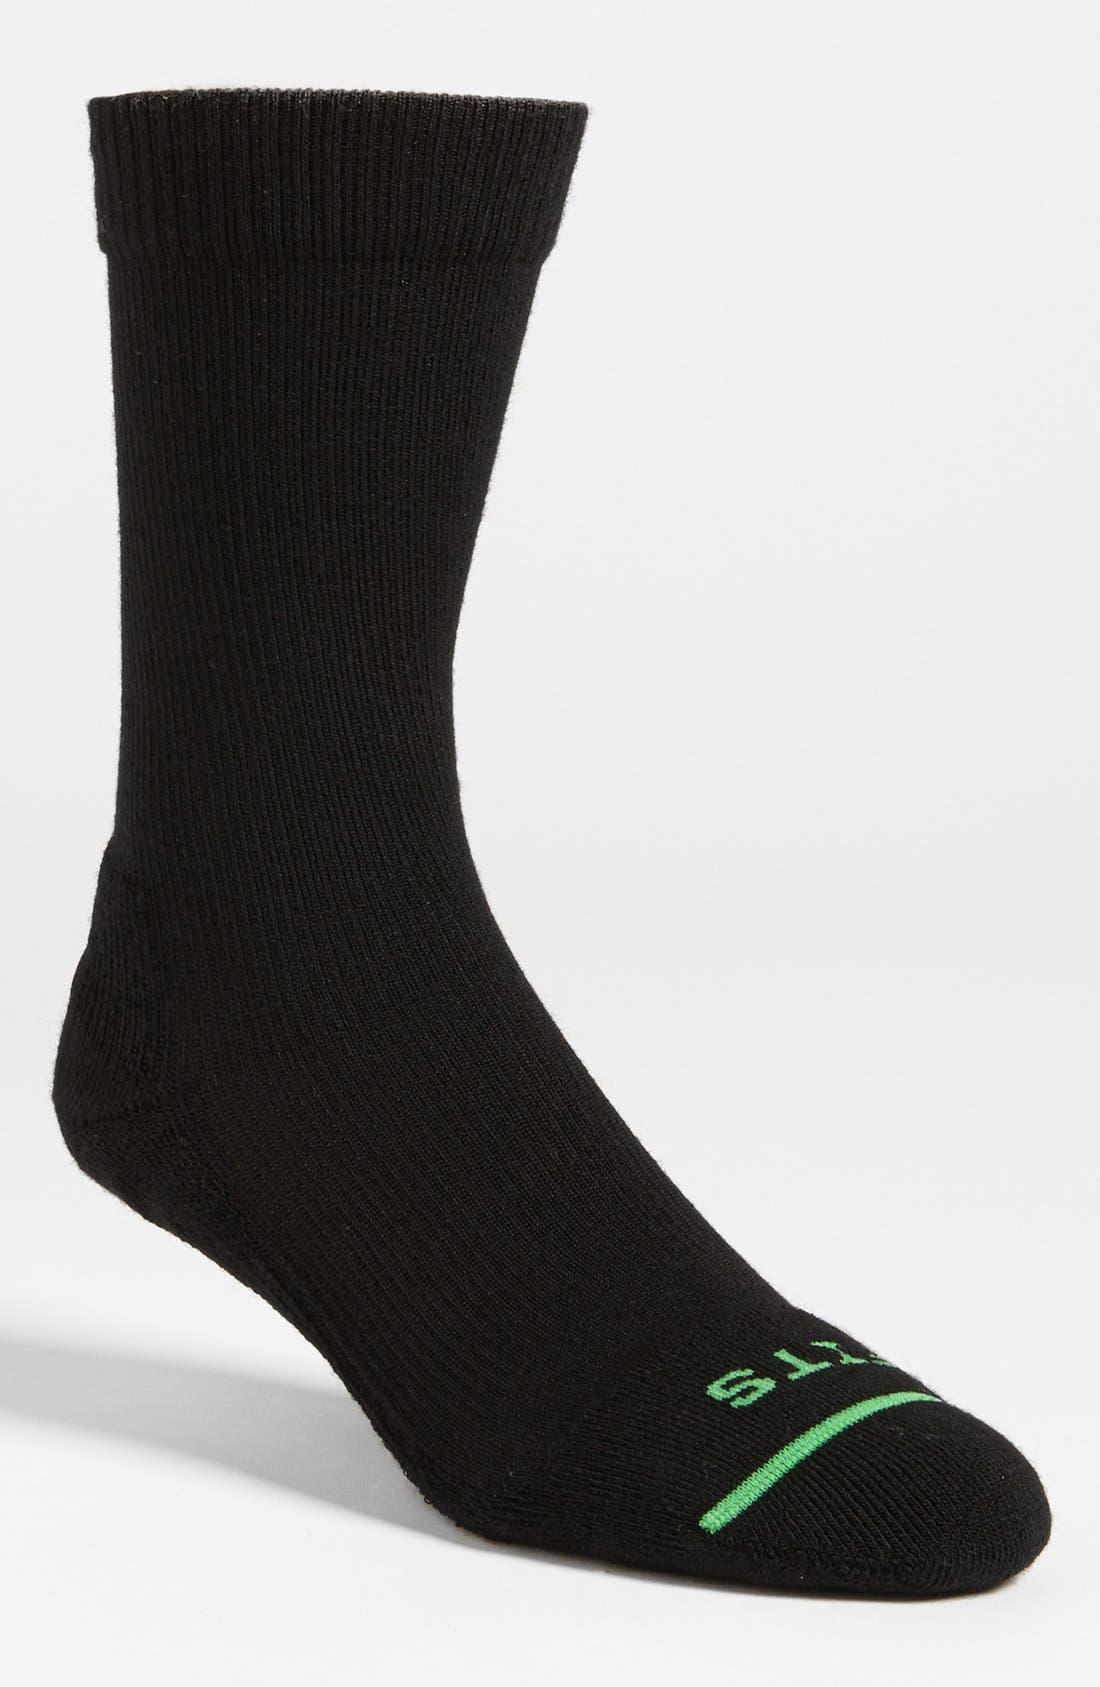 Co. Crew Socks,                         Main,                         color, 001